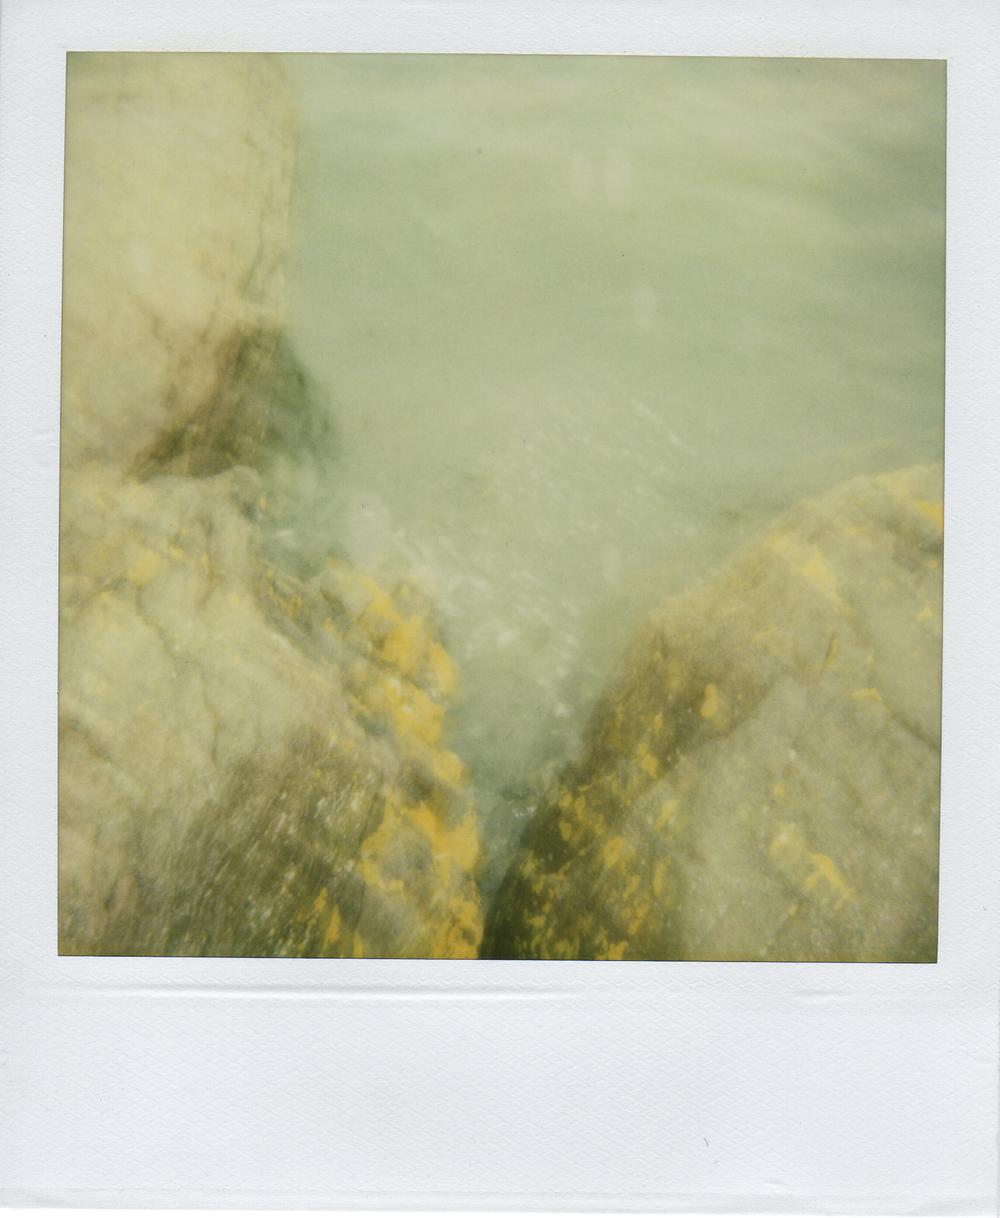 jlaurence-polaroid-103.jpg